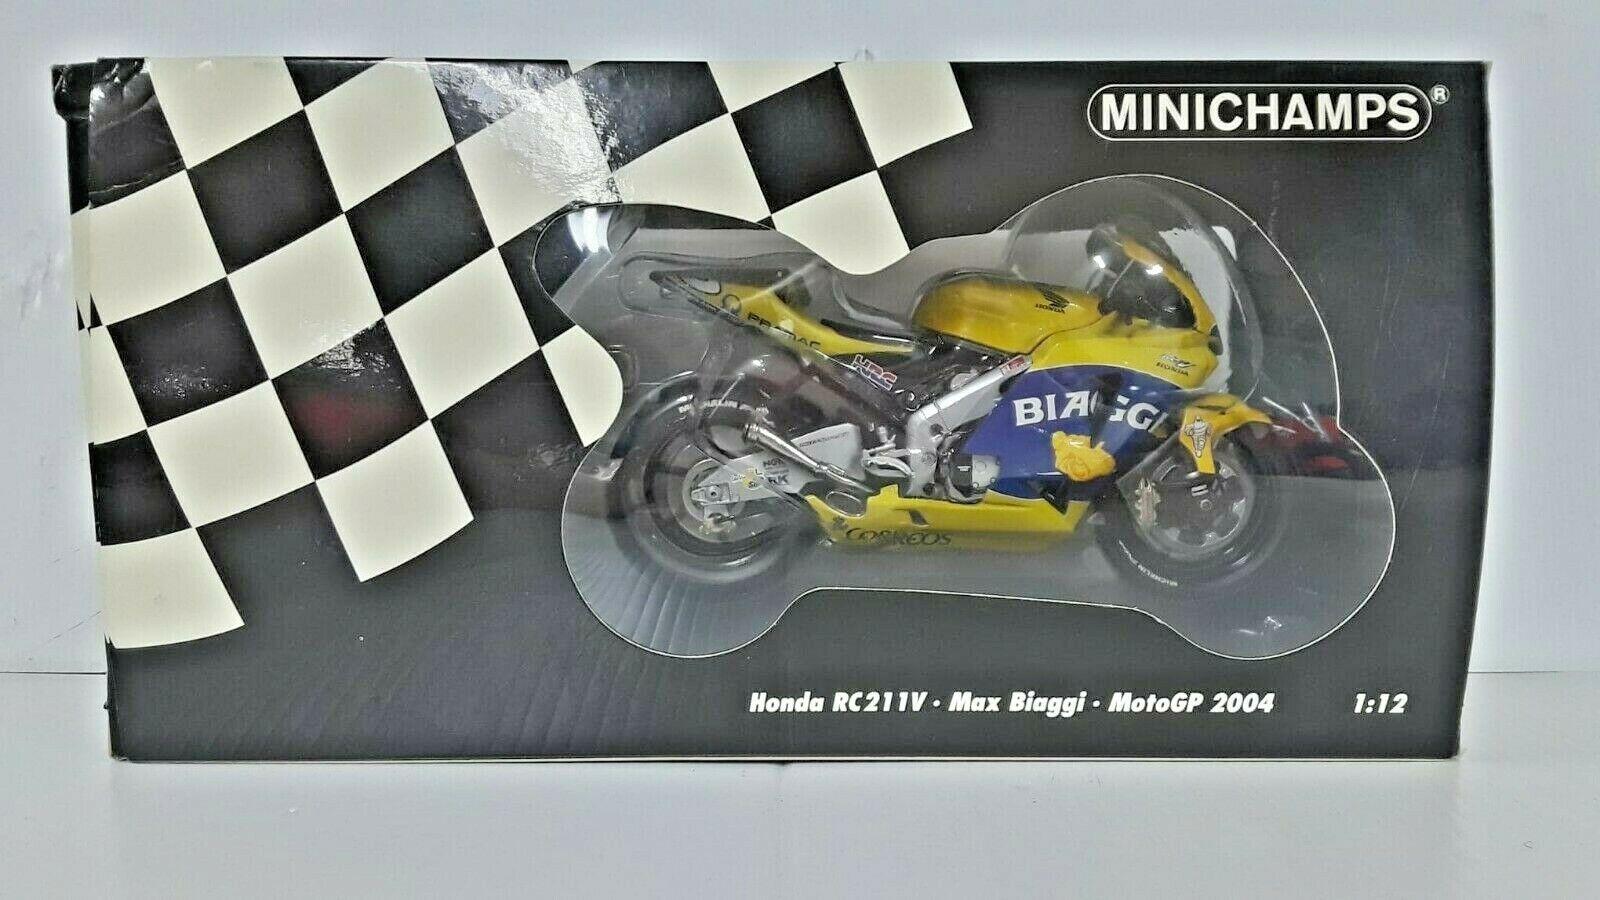 Vintage Minichamps Honda RC211V Max Biaggi Moto GP 2004 1 12 Camel Racing